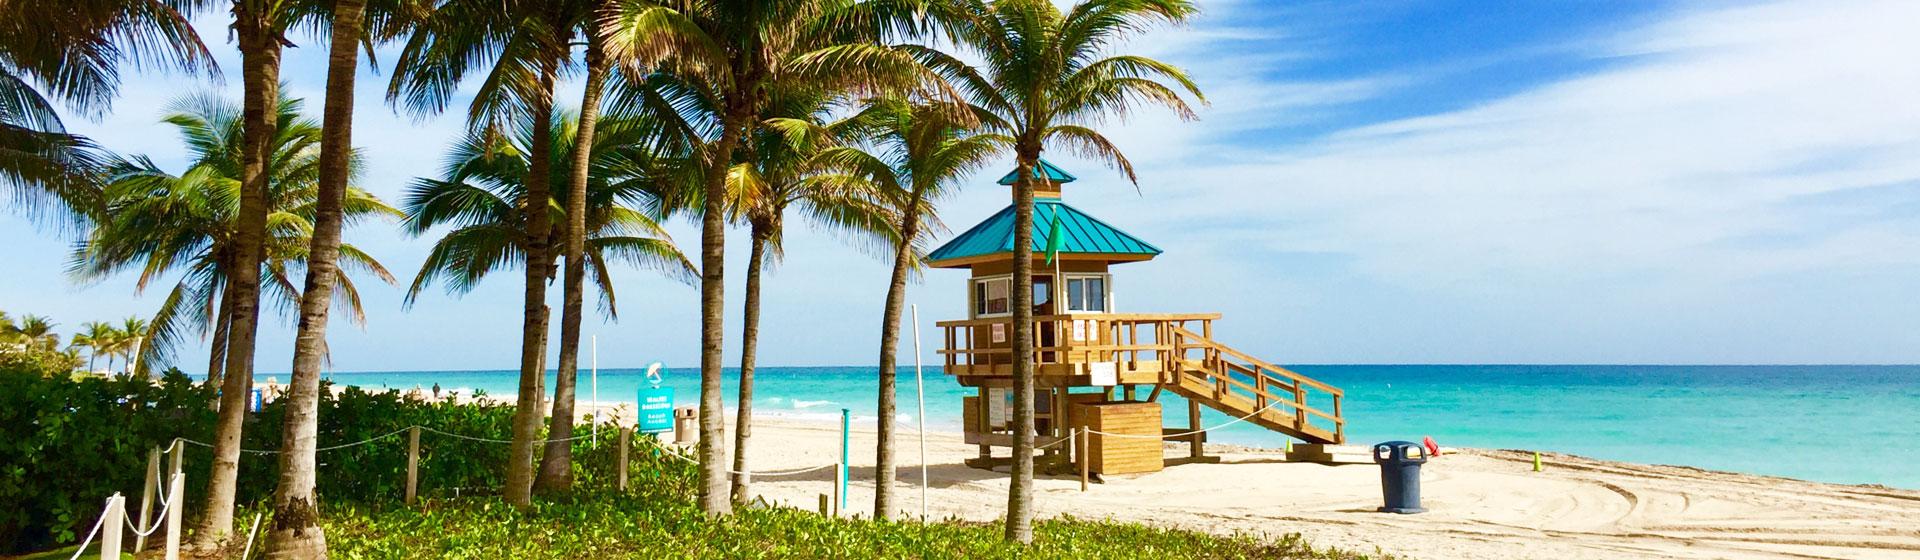 Strandbild i Miami.